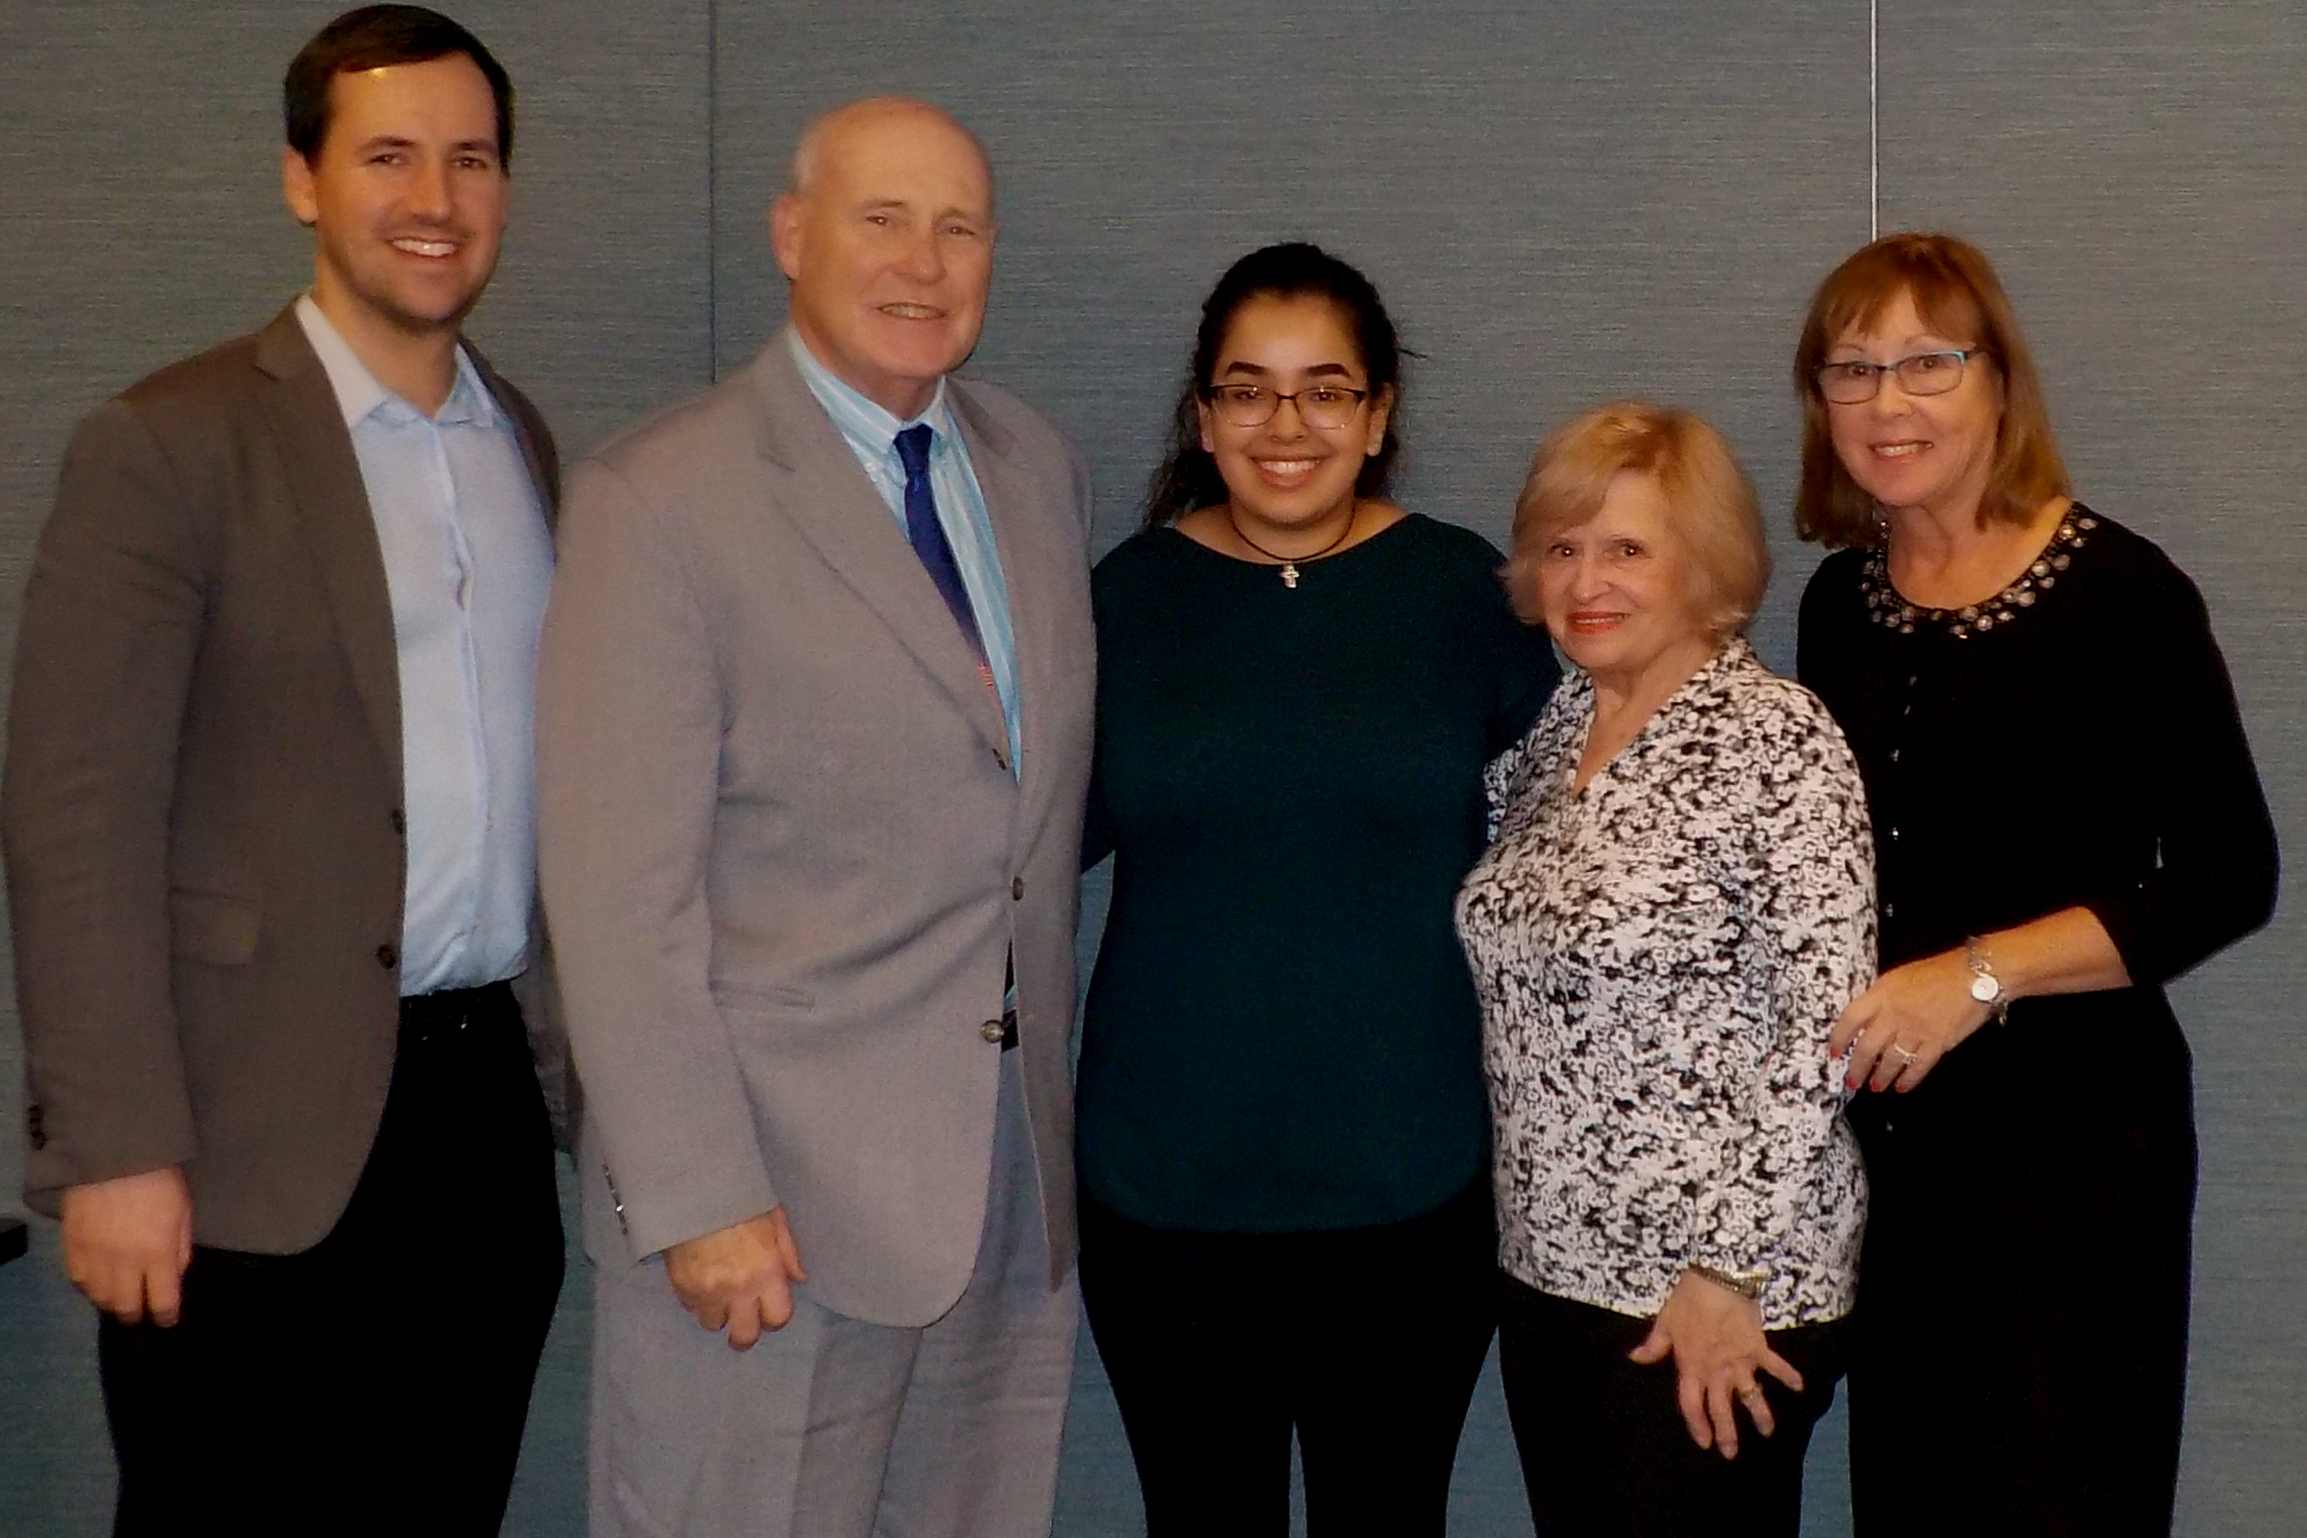 Kevin Gschwind (Study Abroad Coordinator); John H. Mark, Sr.; Melissa Gallardo; Angela P. Mark; Mary Ellen Malone, (Director of Planned Giving)